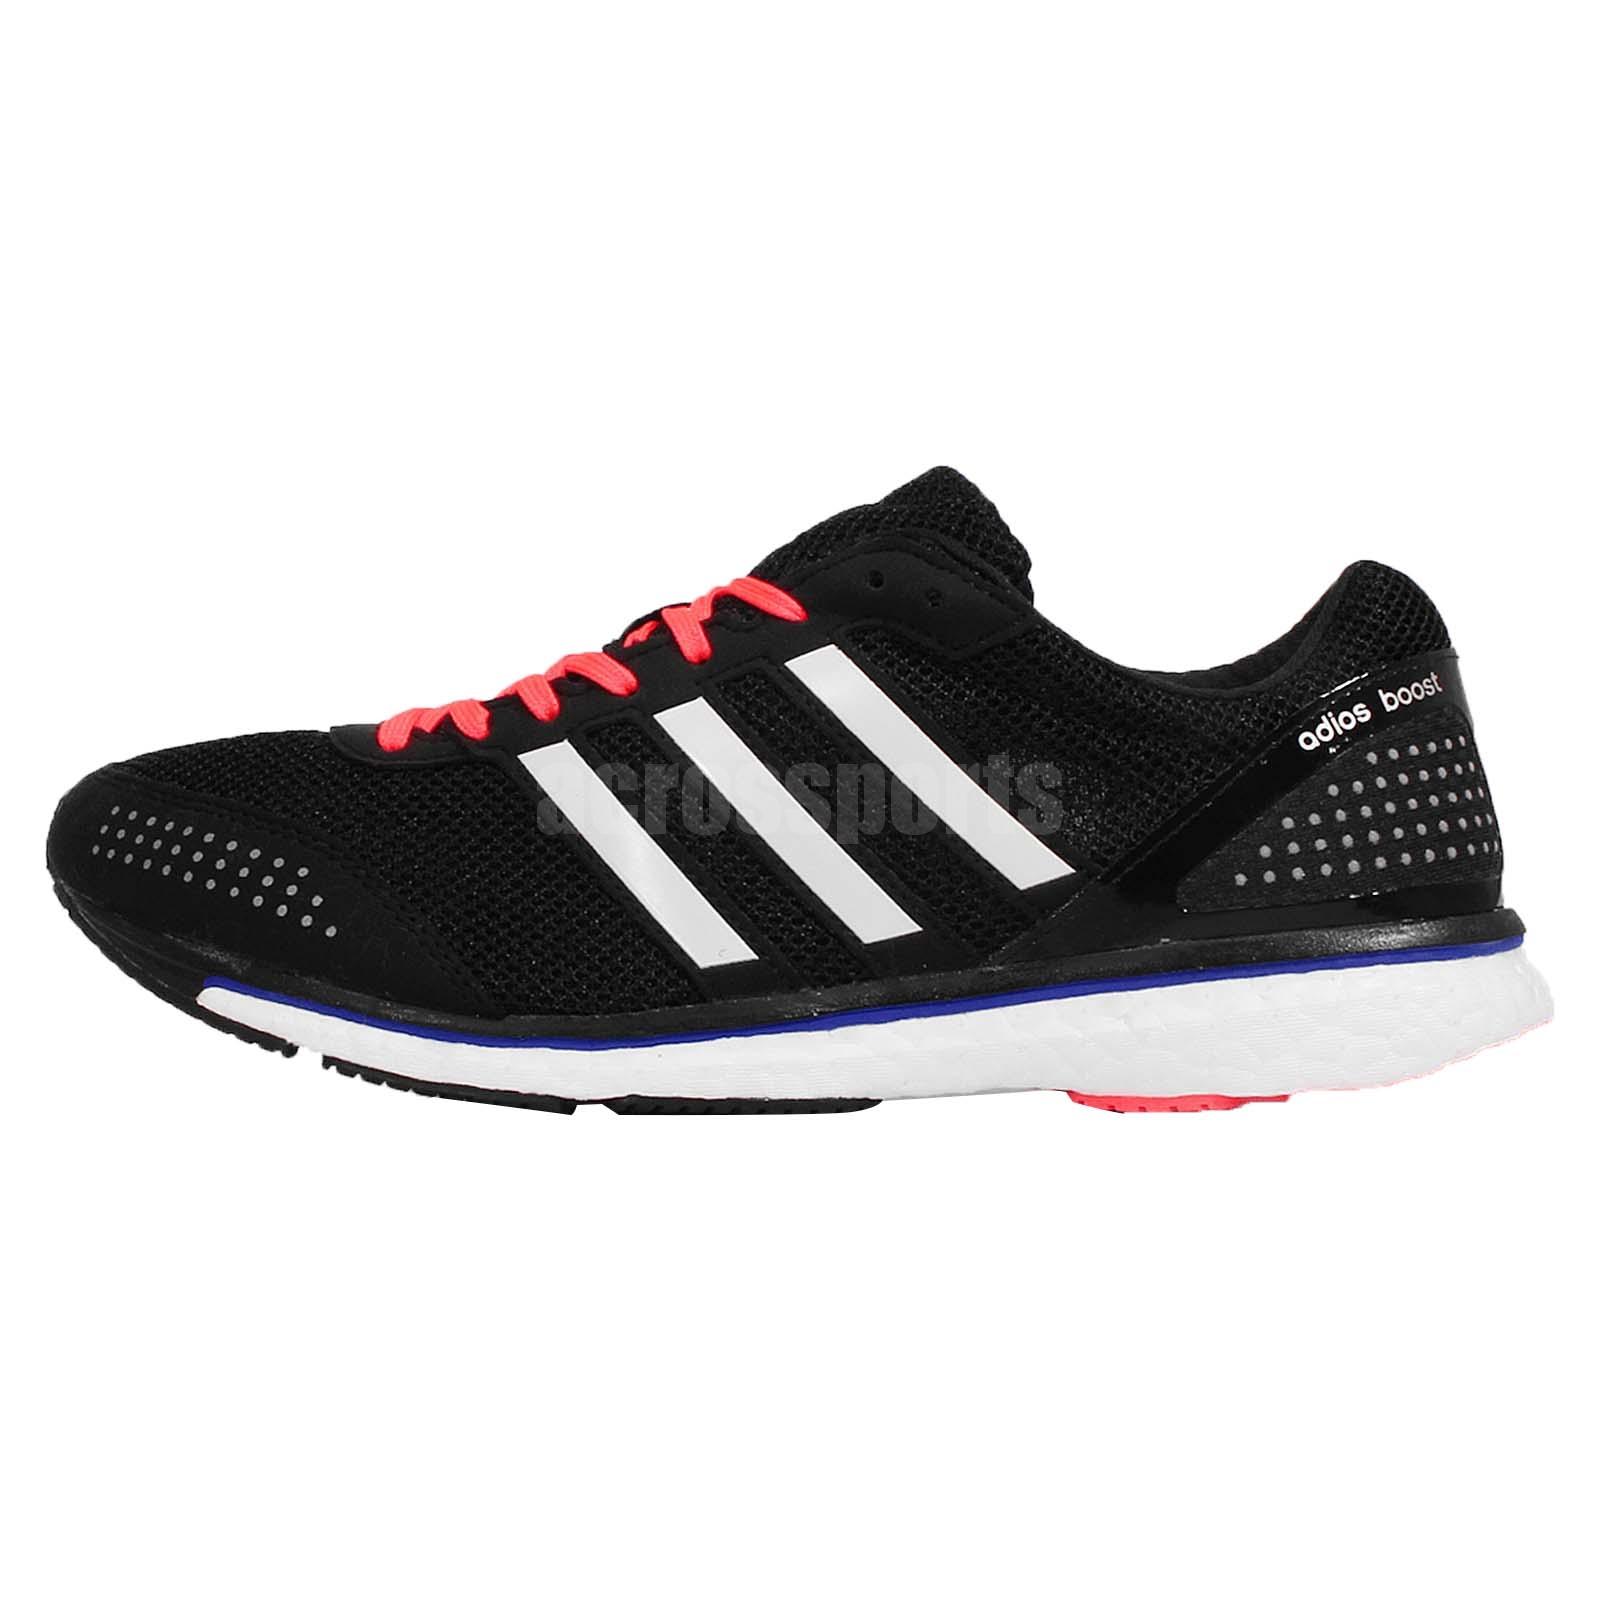 Adidas Adizero Adios Boost  Mens Shoes Red White